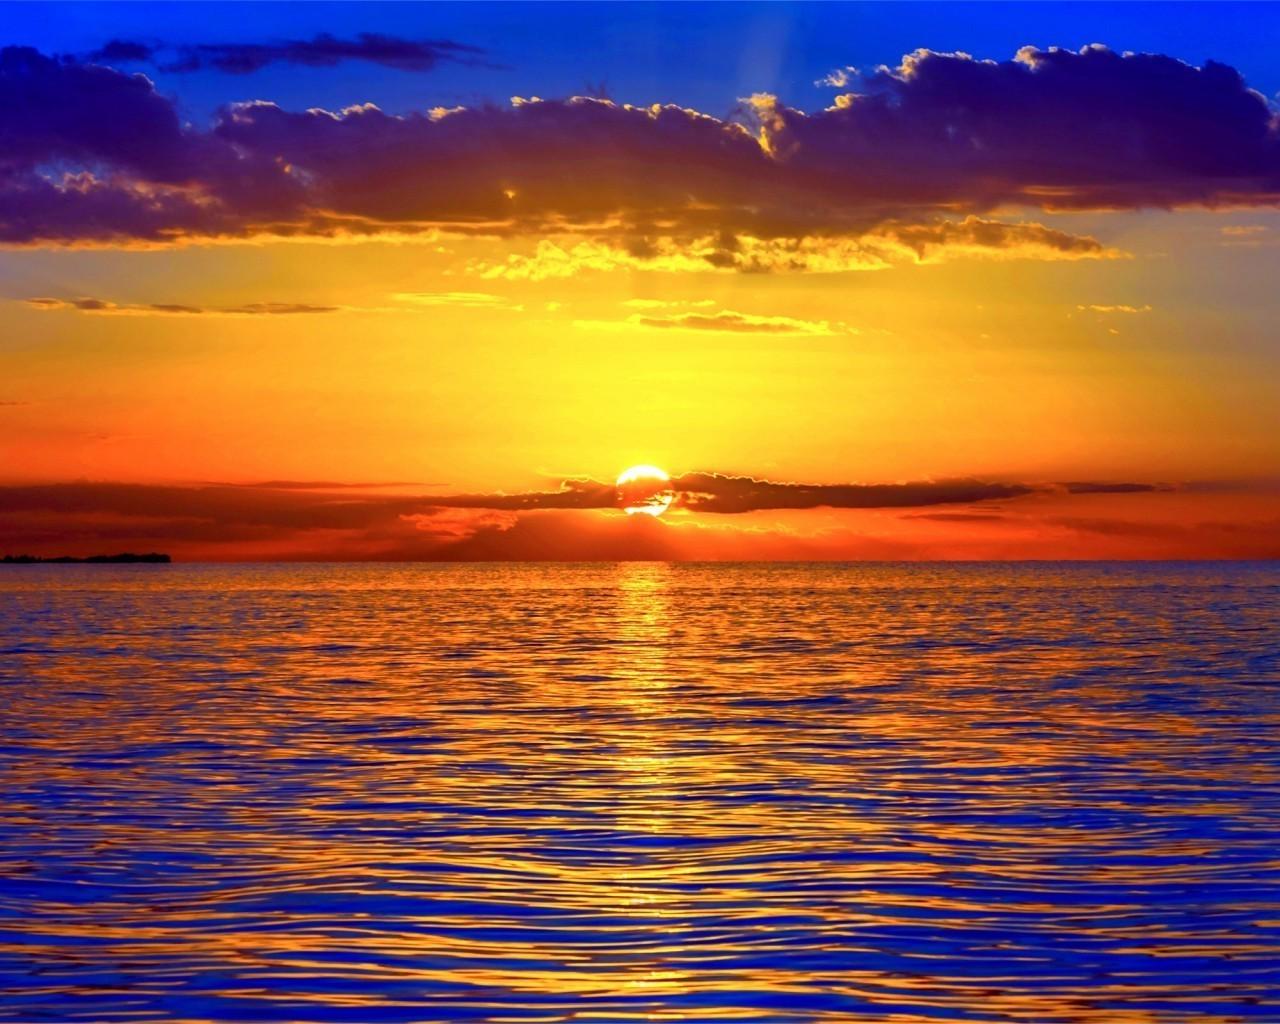 фото остров зак